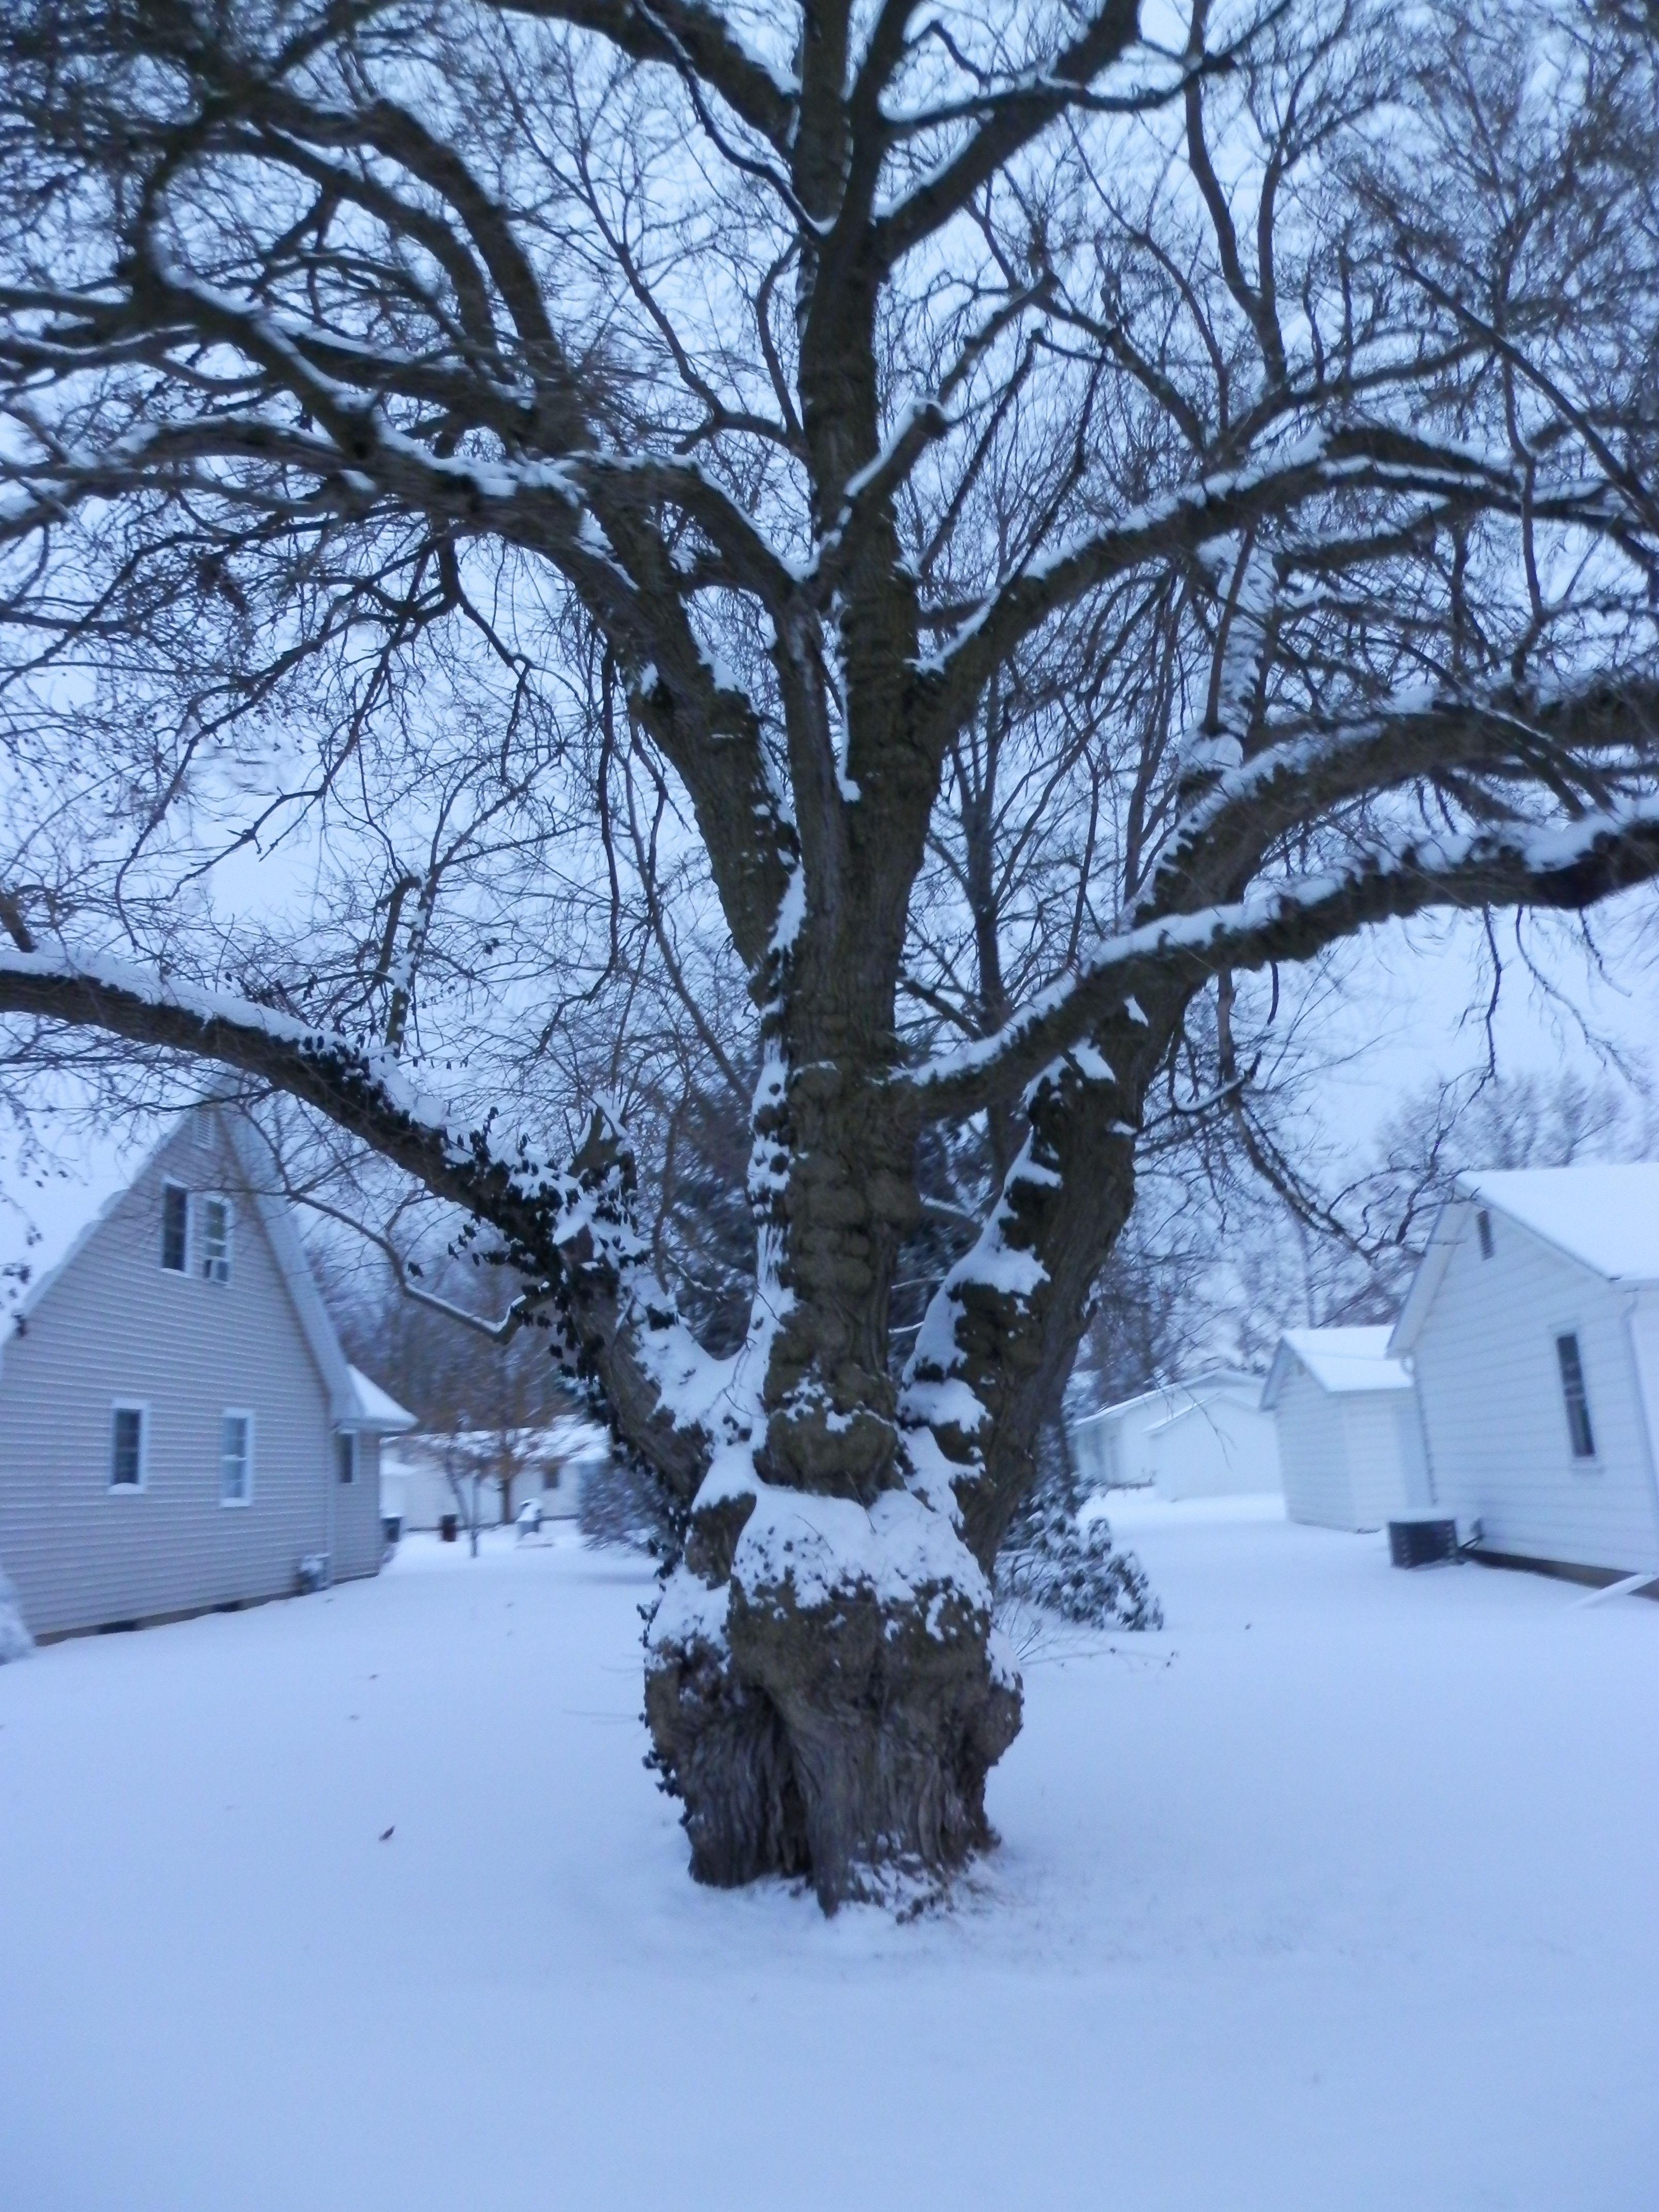 Old tree in a winter wonderland. Winter wonderland, Tree